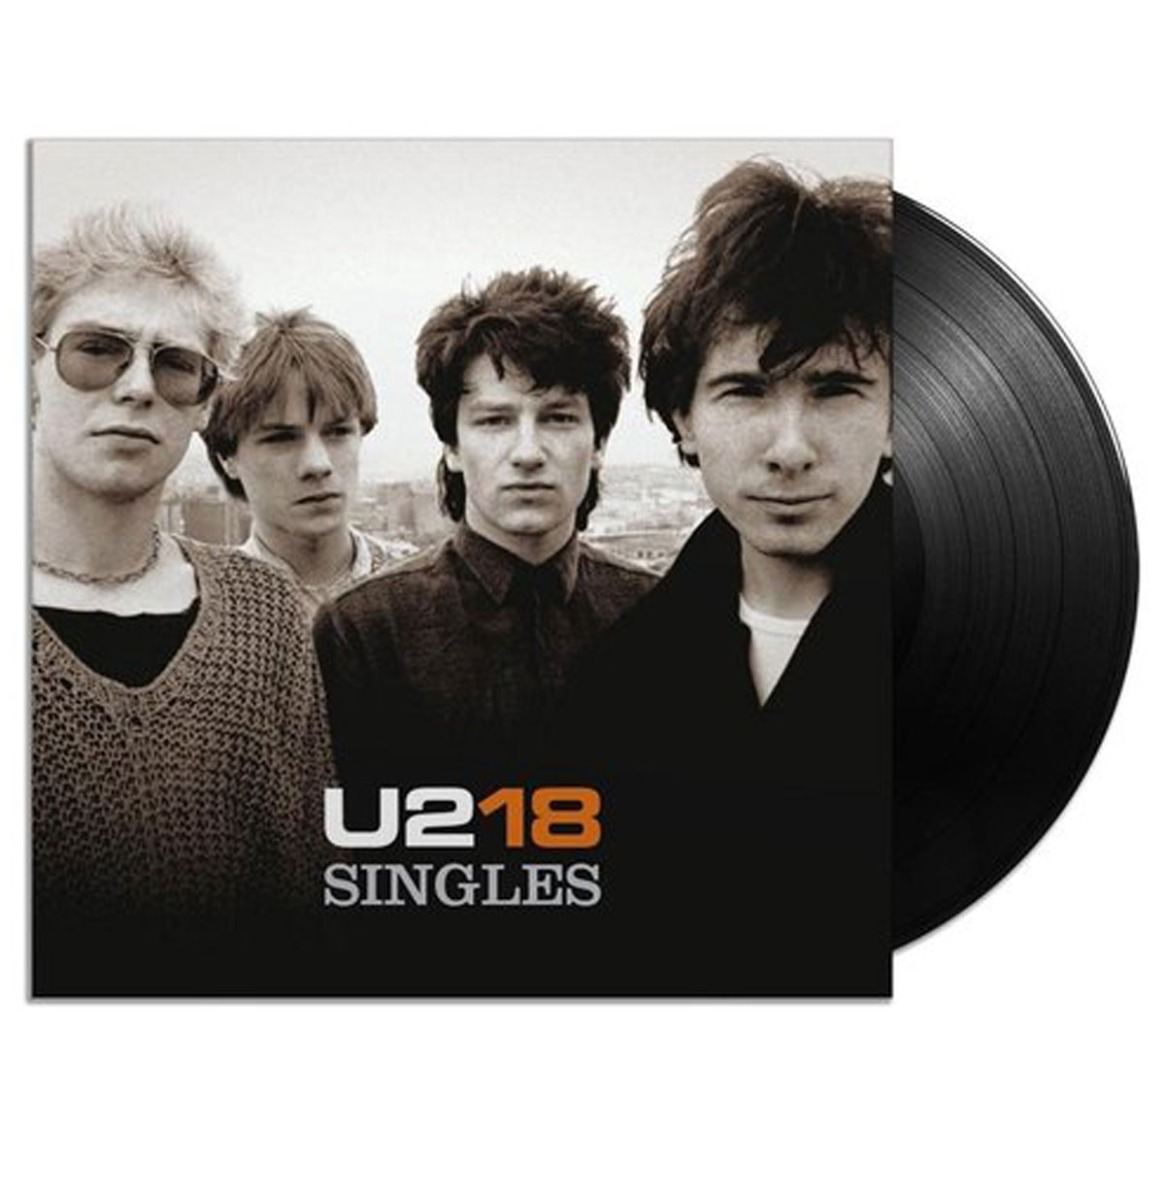 U2 - 18 Singles 2 LP